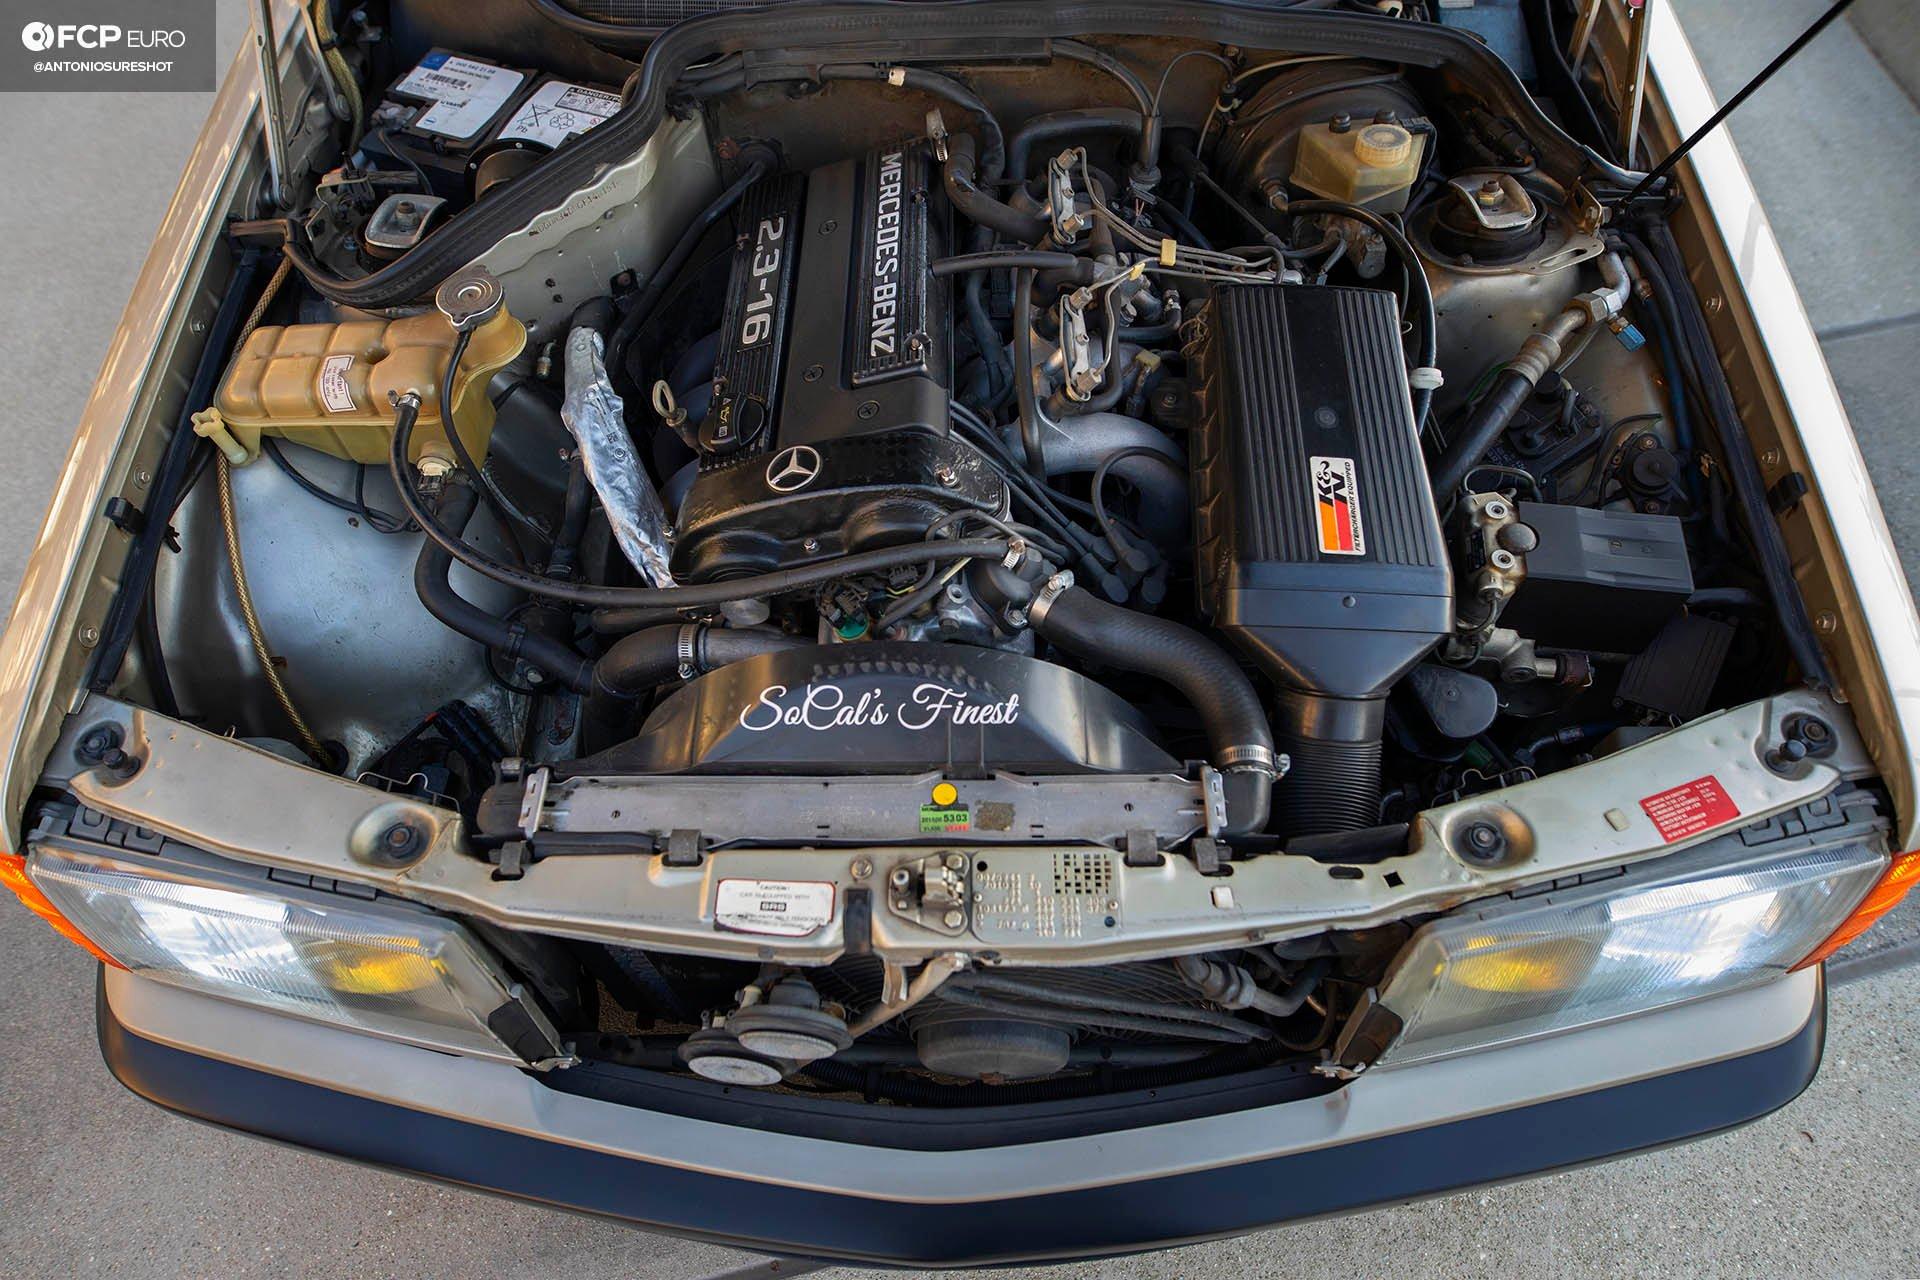 Mercedes Benz 190E 2.3 16v Cosworth EOSR1523